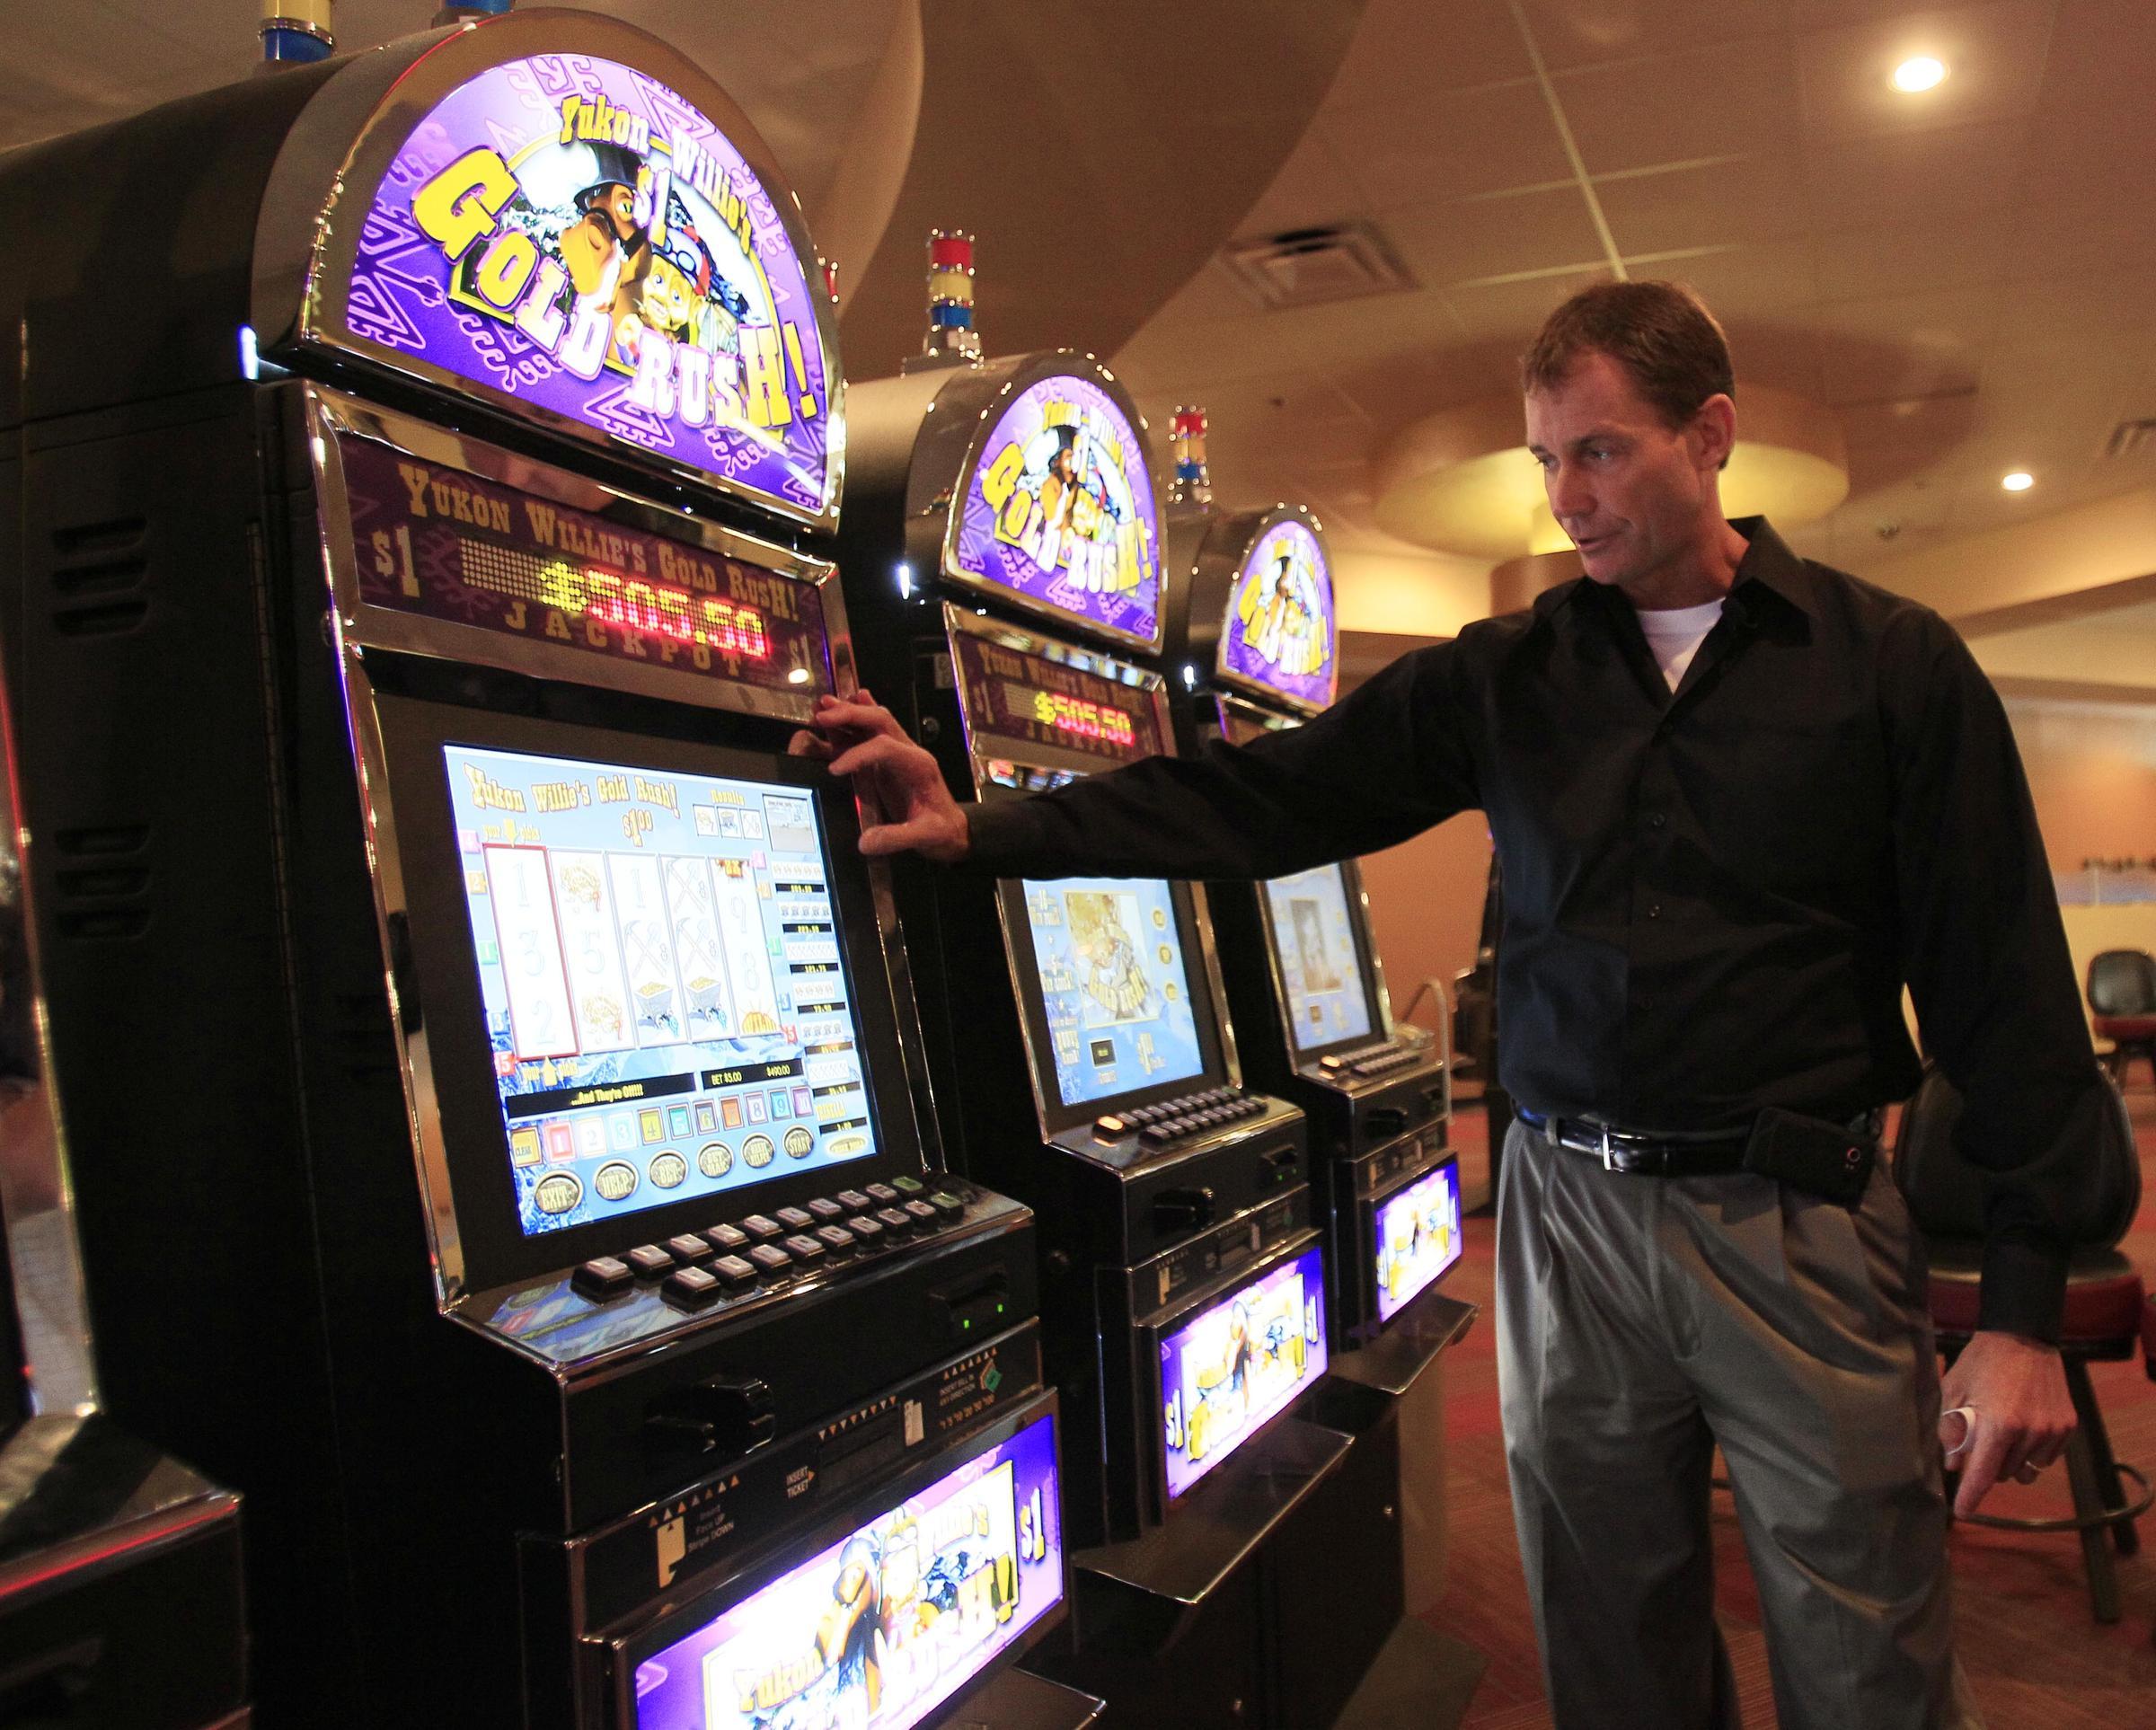 Kentucky downs casino roulette gambling set